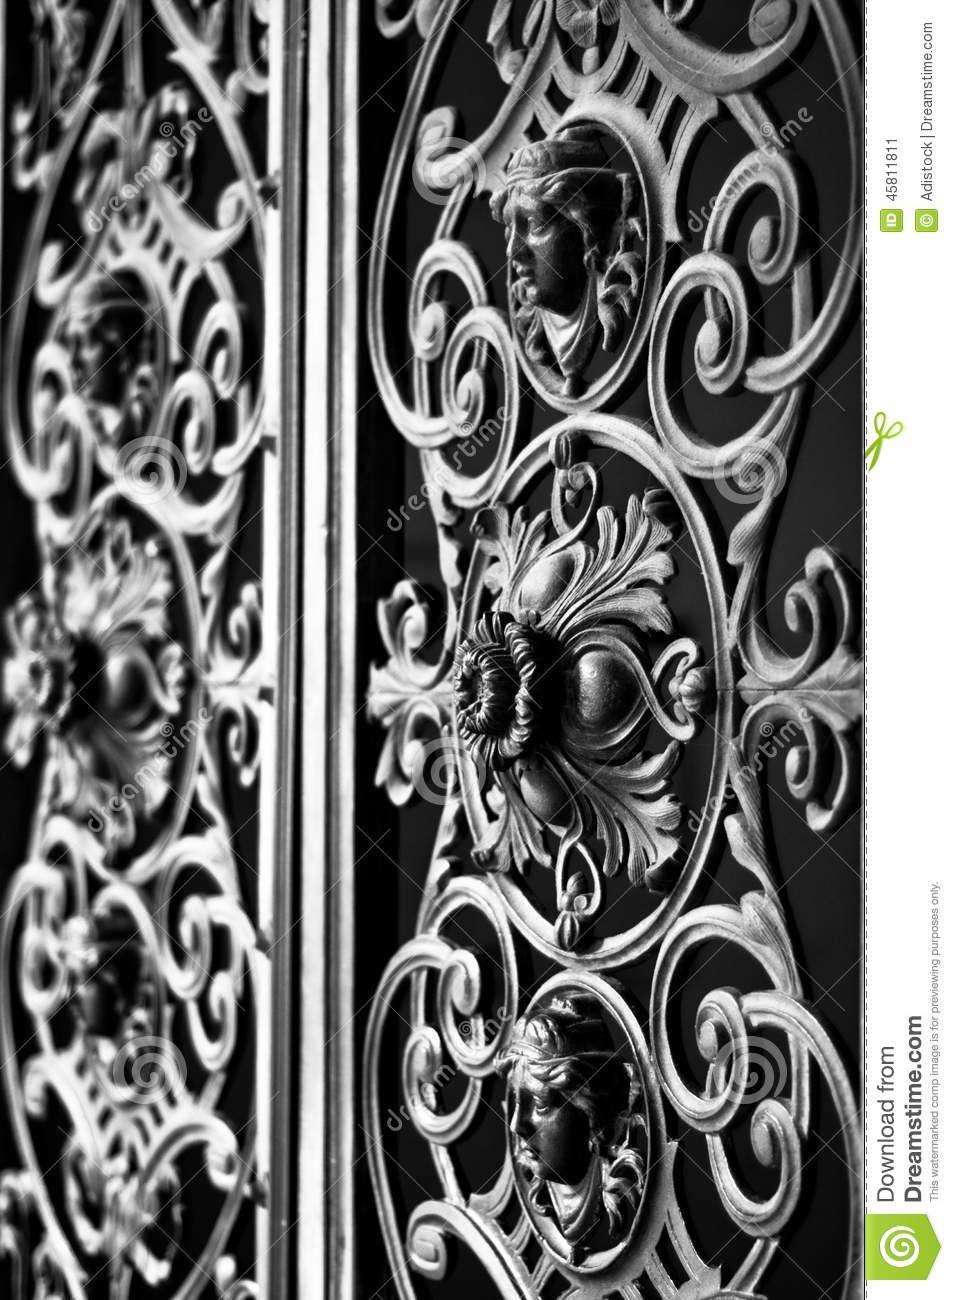 Decorative metal gate ornament. Antique iron door with classic ornaments. & Decorative metal gate ornament. Antique iron door with classic ...